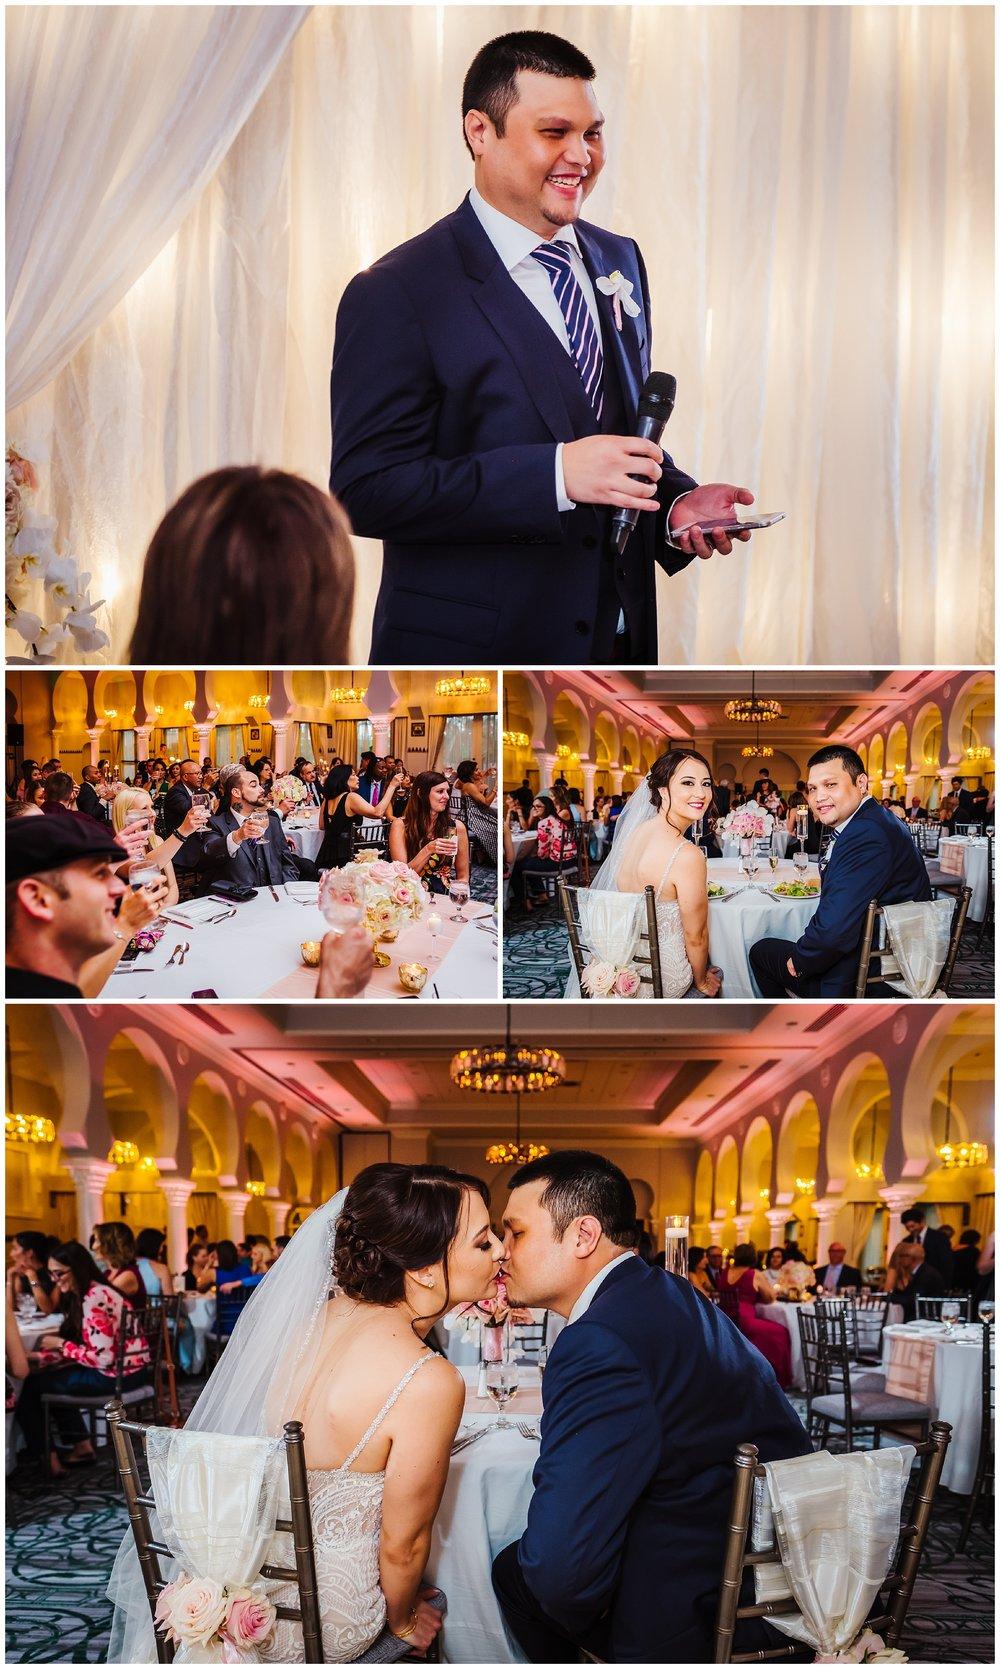 vinoy-sunset-ballroom-rainy-day-wedding-photography-orchids-trinidad-flawless-fetes-ashlee-hamon_0152.jpg